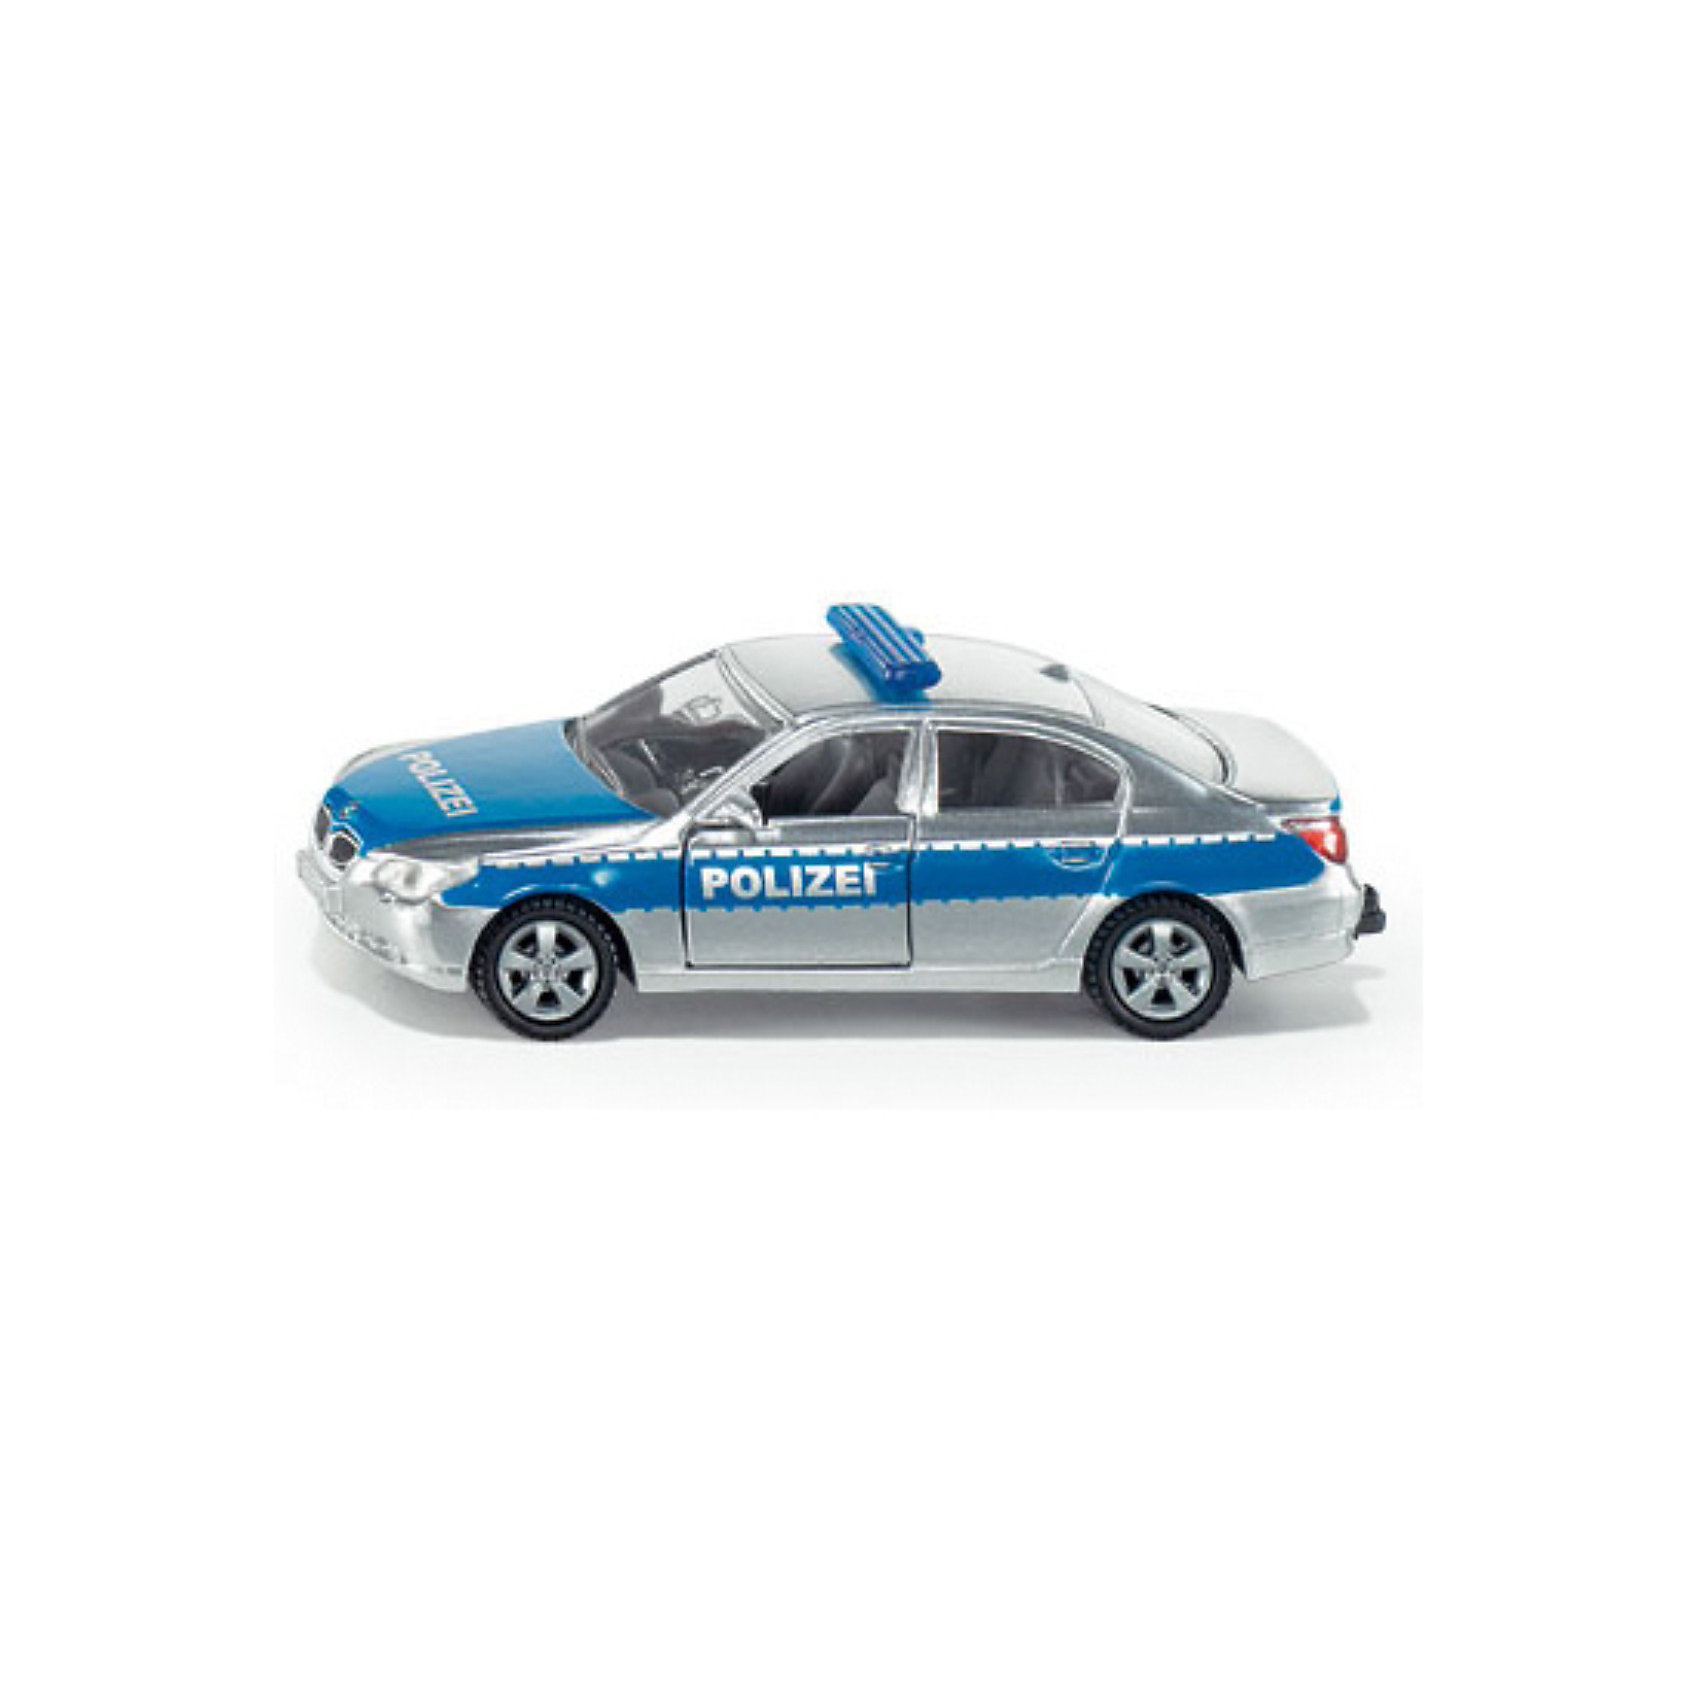 SIKU SIKU 1352 Полицейская патрульная машина siku siku 1007 bmw 645i cabrio